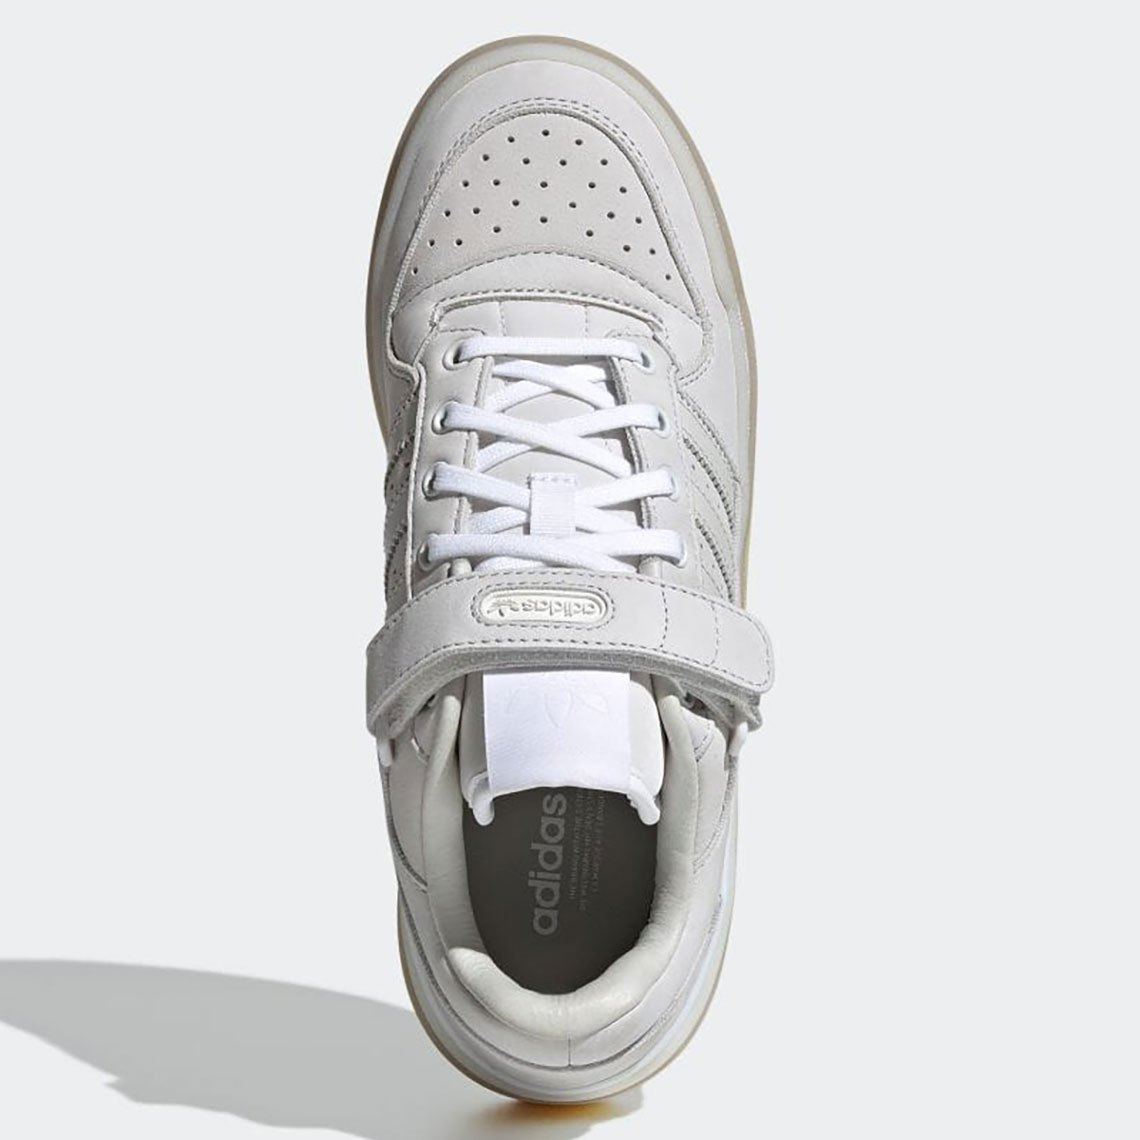 Adidas Triple Platforum Lo